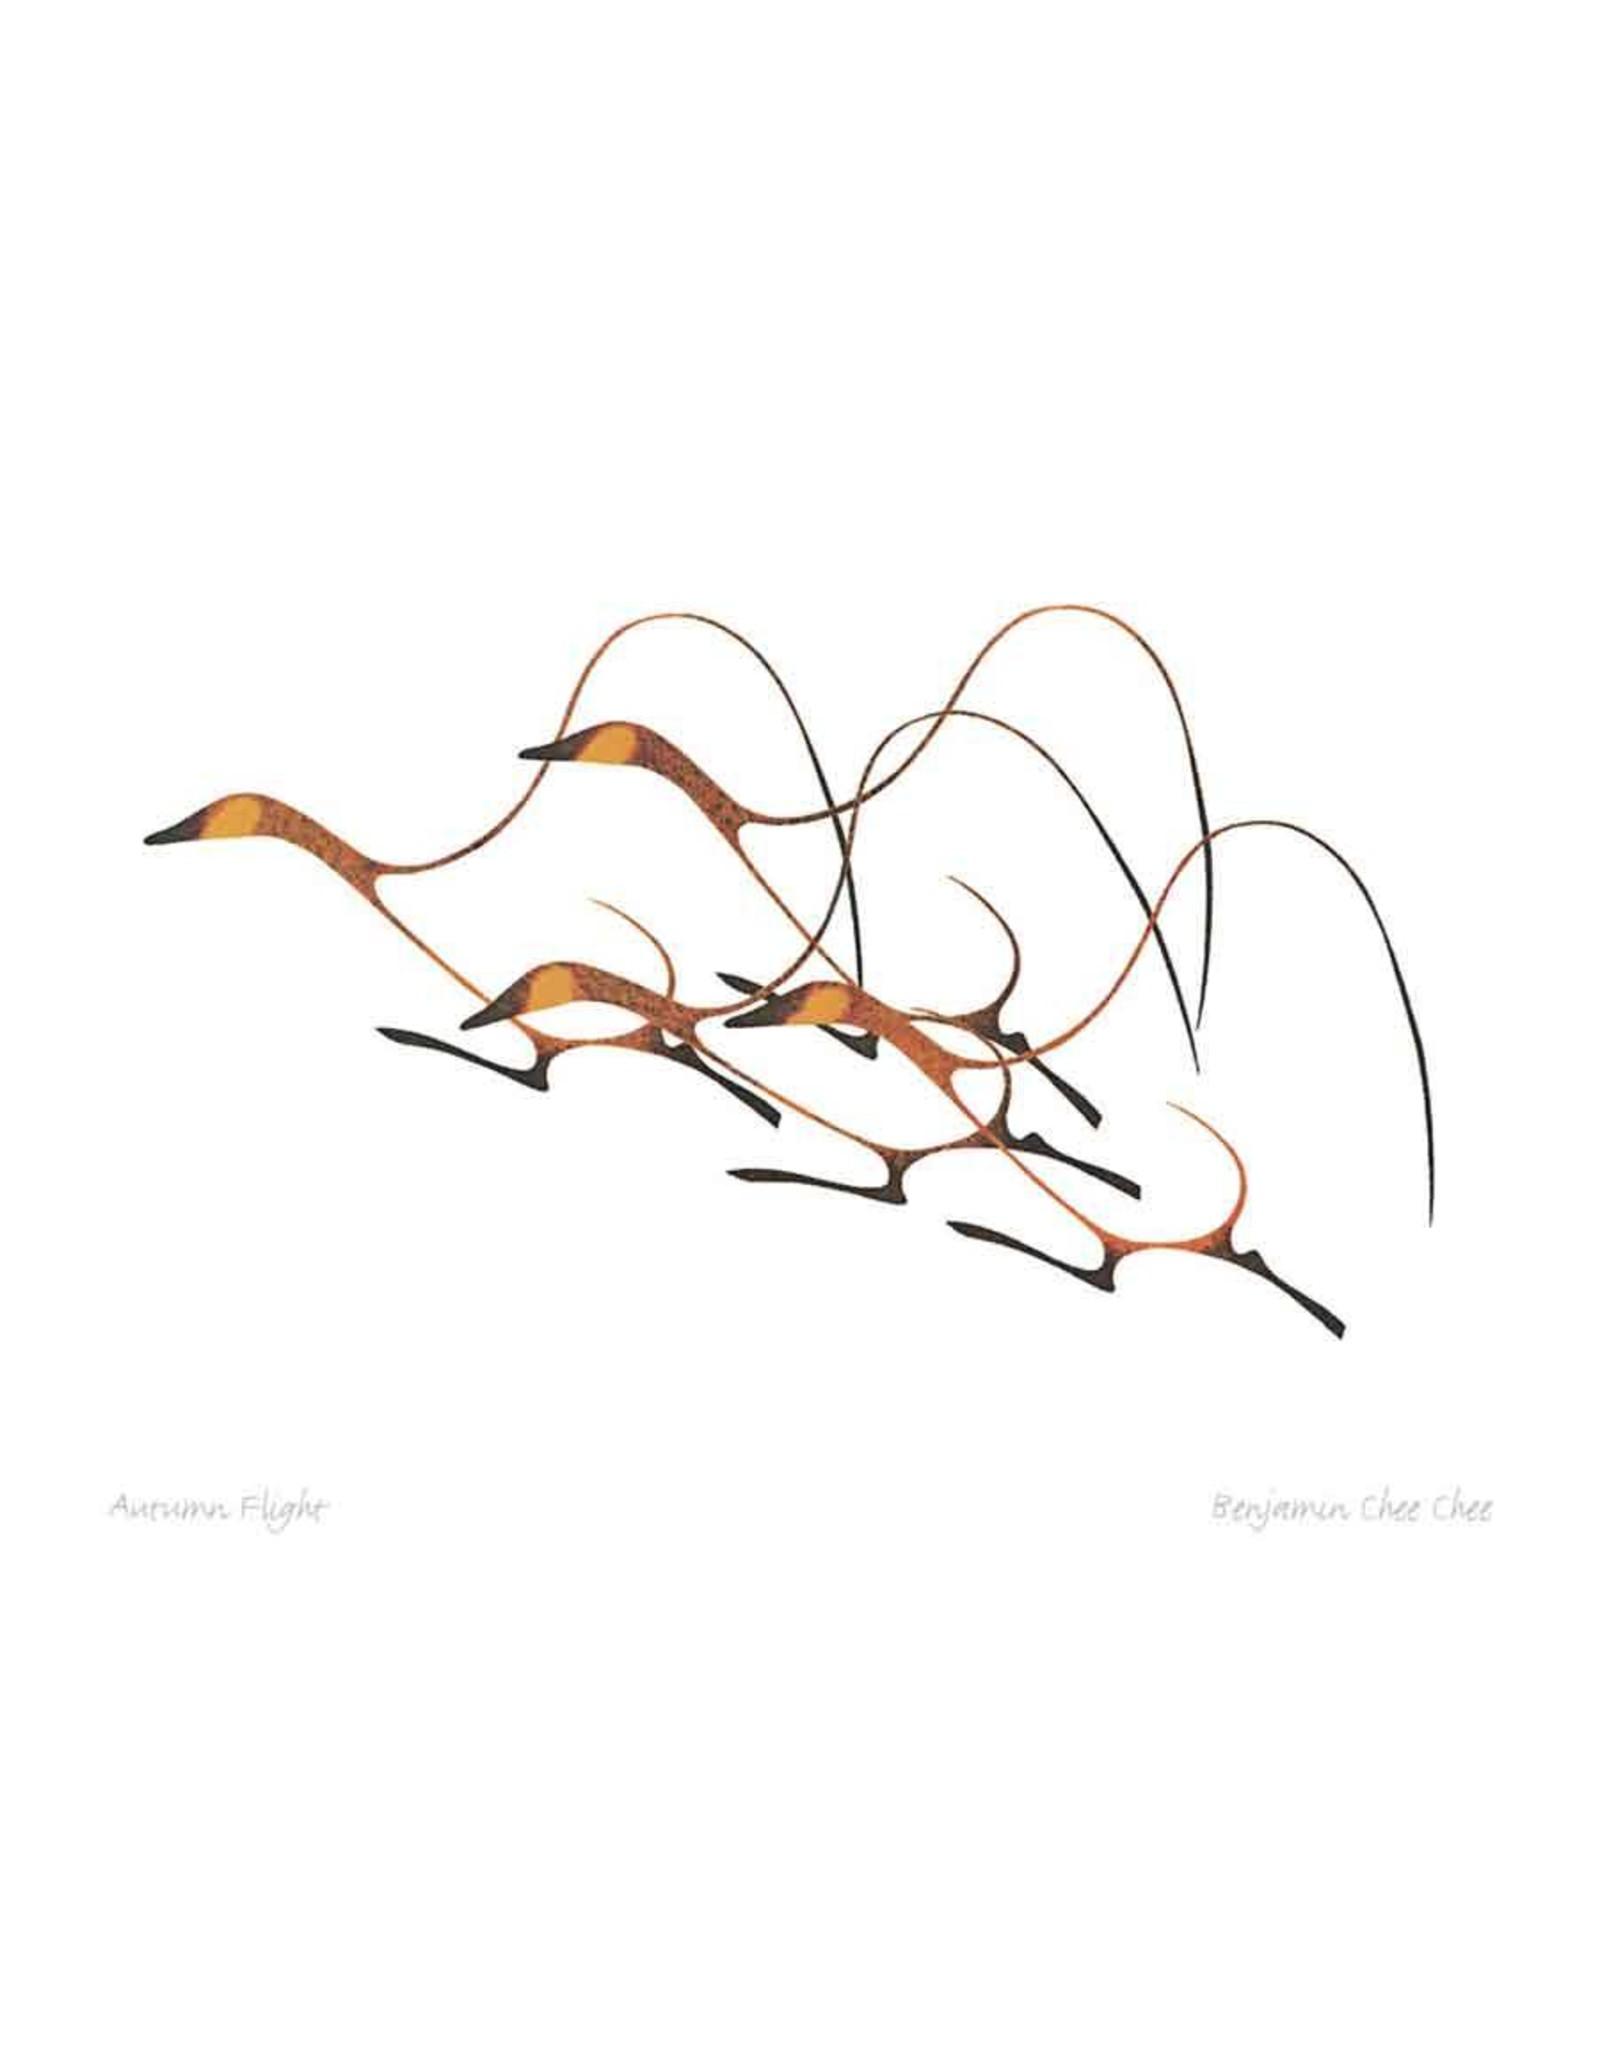 Autumn Flight by Benjamin Chee Chee Card